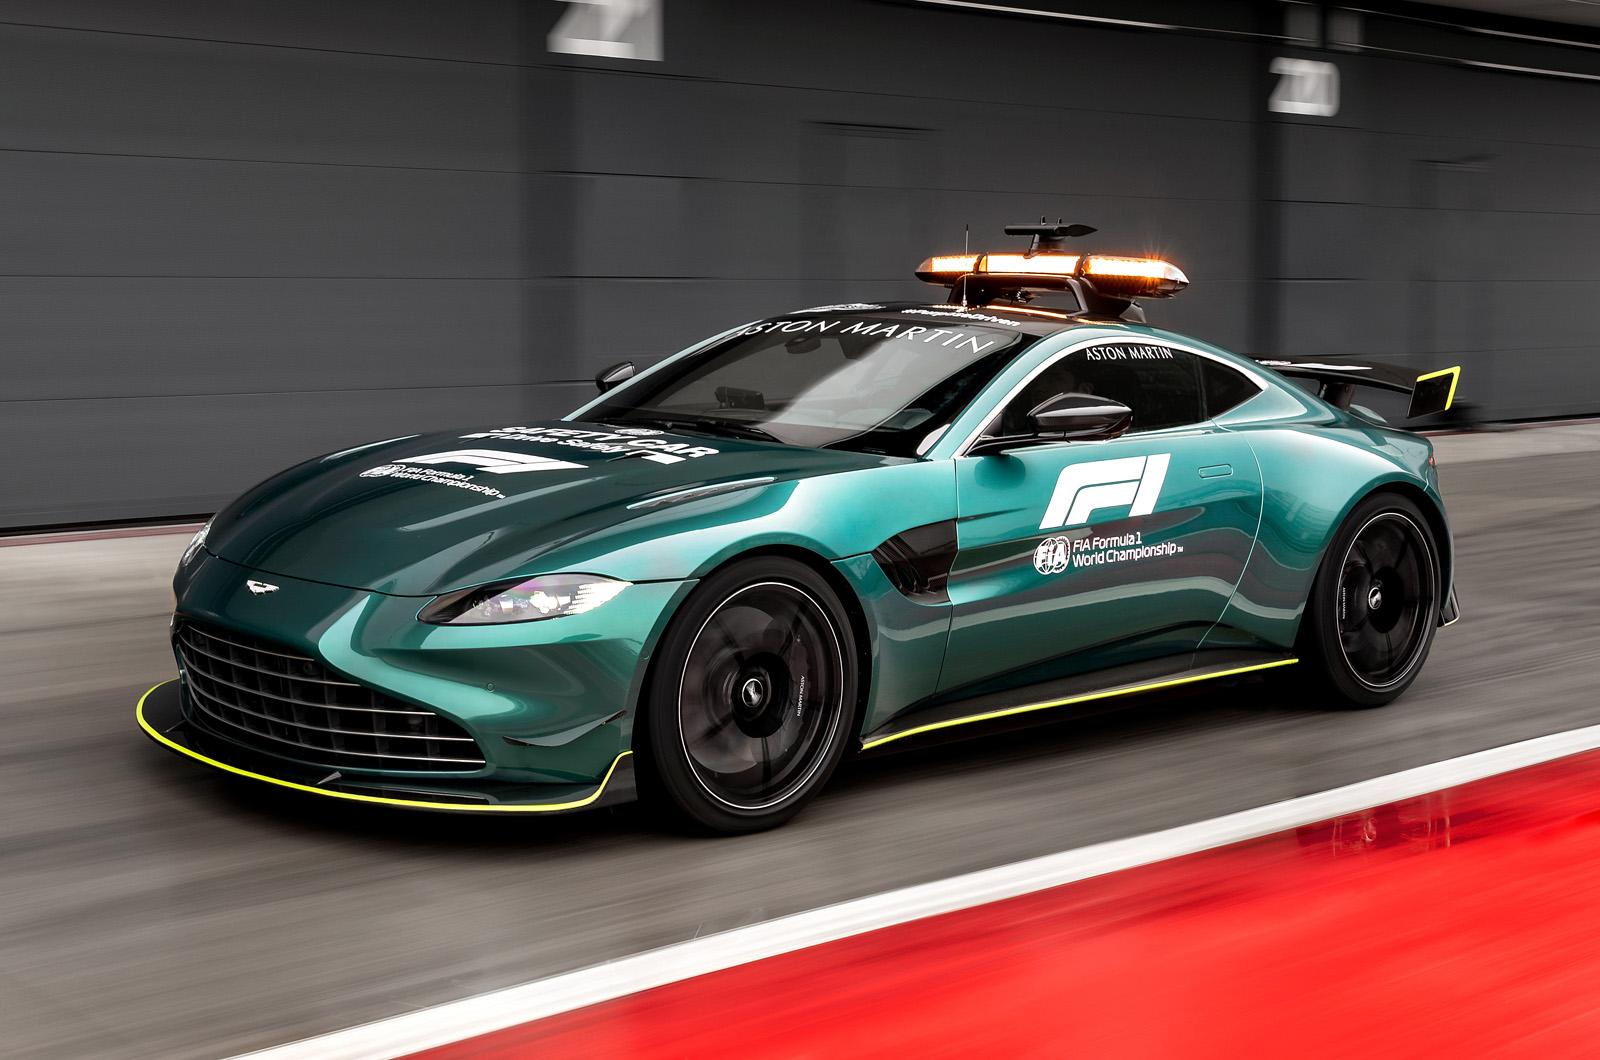 Aston Martin reveals uprated Vantage Formula 1 safety car | Autocar